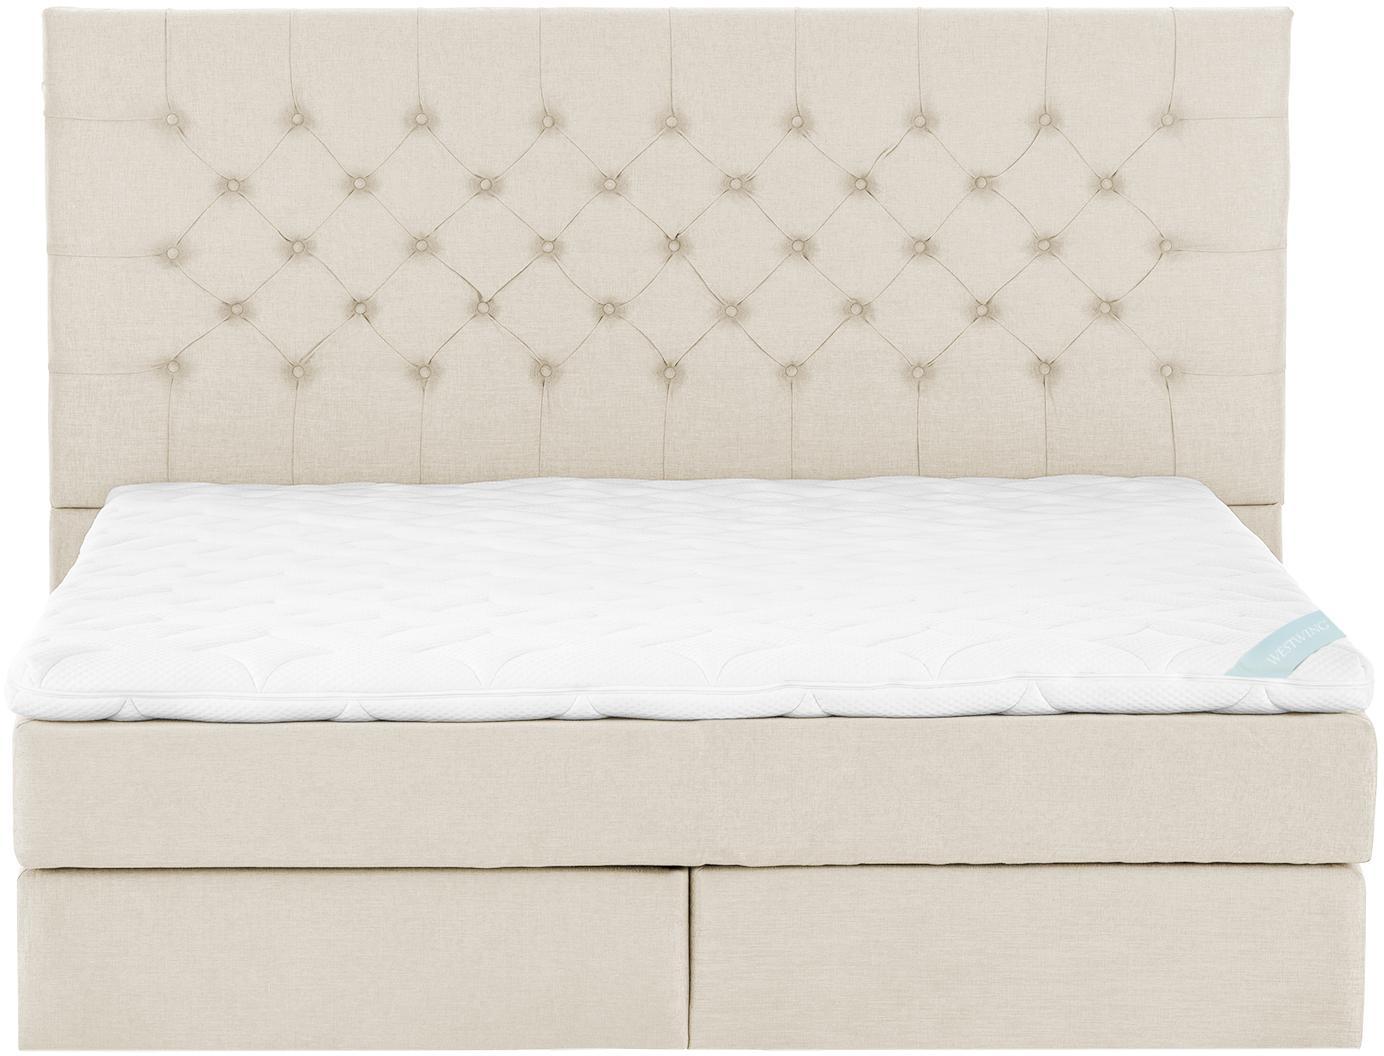 Premium Boxspringbett Phoebe, Matratze: 7-Zonen-Taschenfederkern , Füße: Massives Buchenholz, lack, Beige, 180 x 200 cm